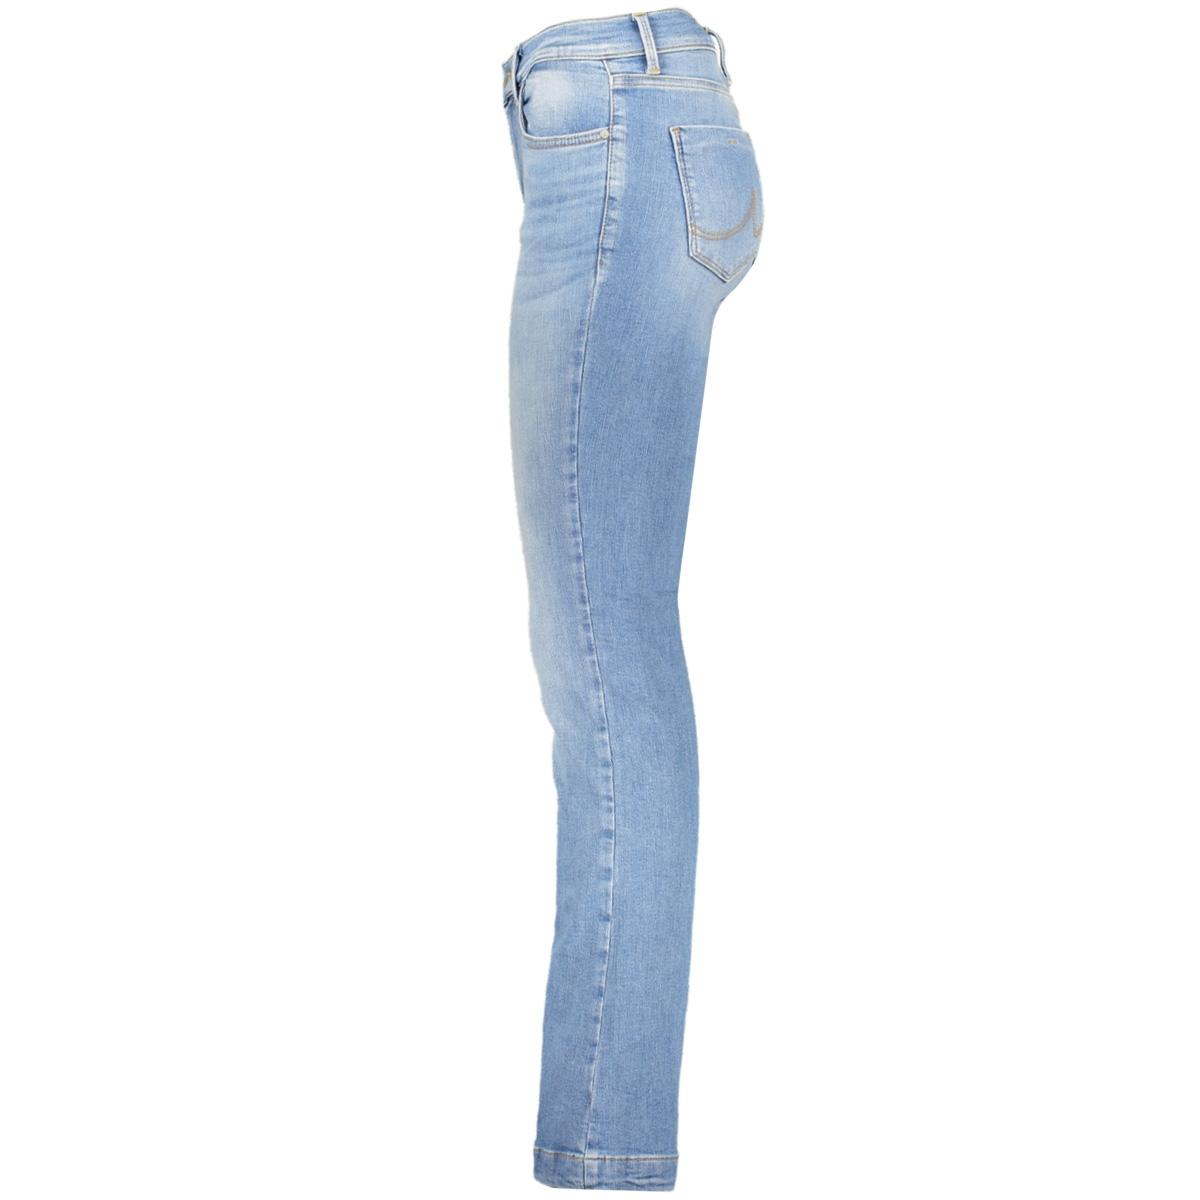 fallon 51367 ltb jeans 52155 leona undamaged wash